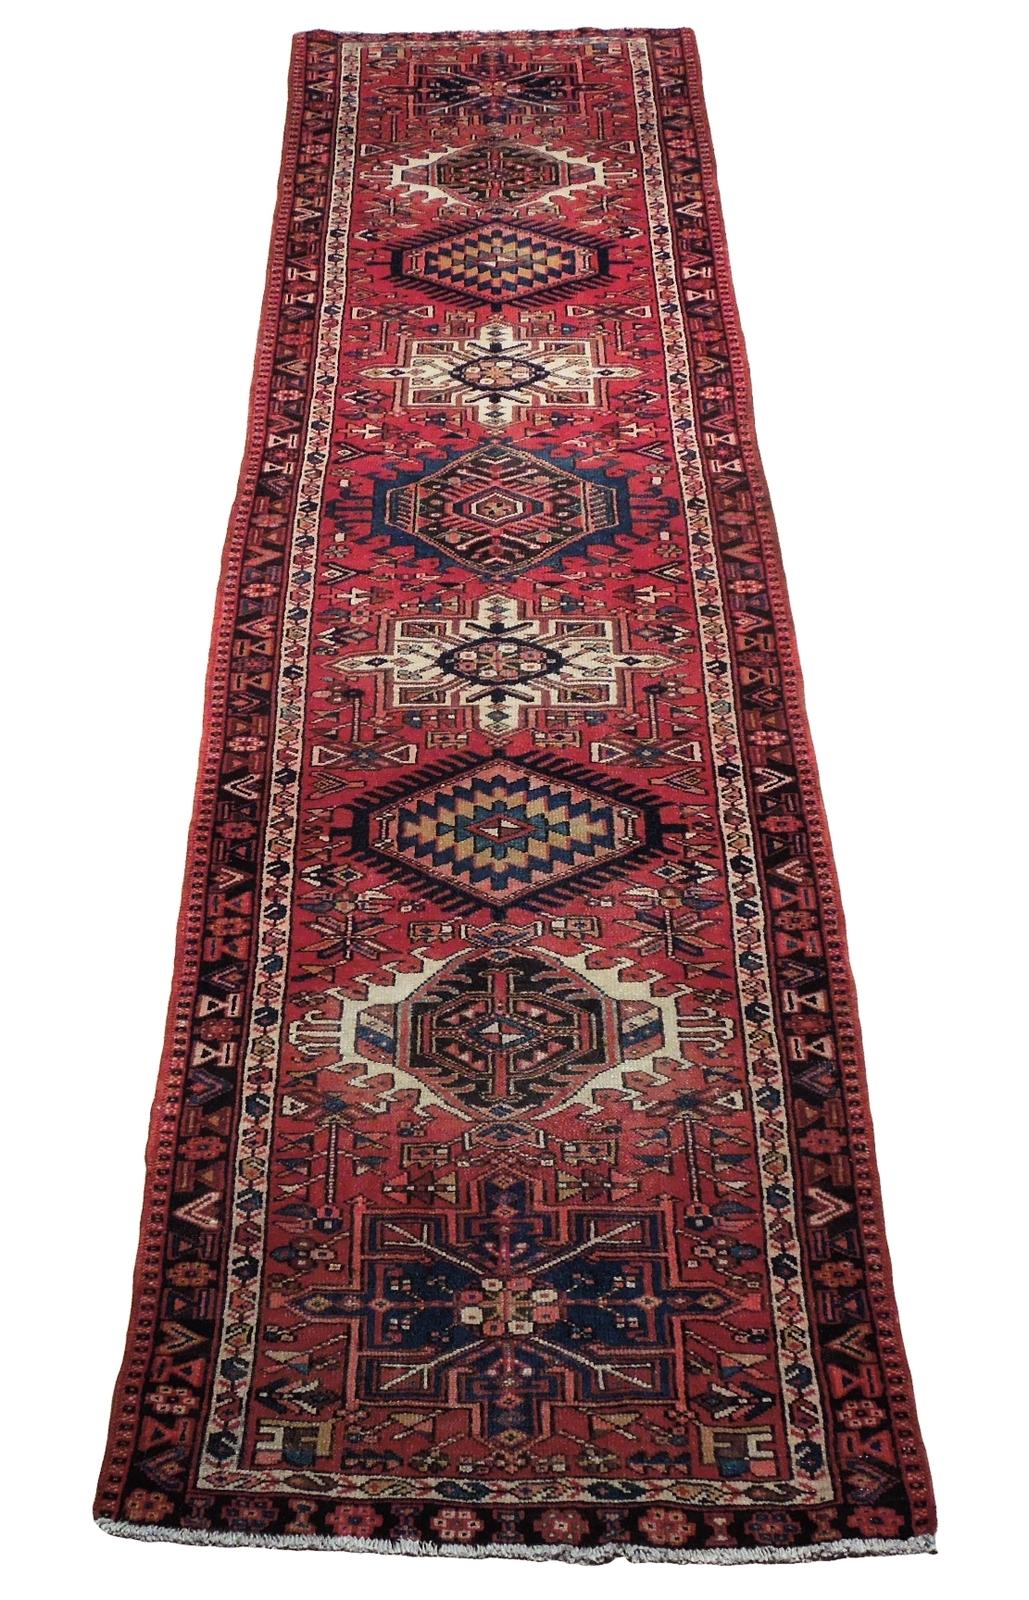 Red 3 x 13 All-Over Classic Tribal Design Runner Karaja Persian Handmade Rug